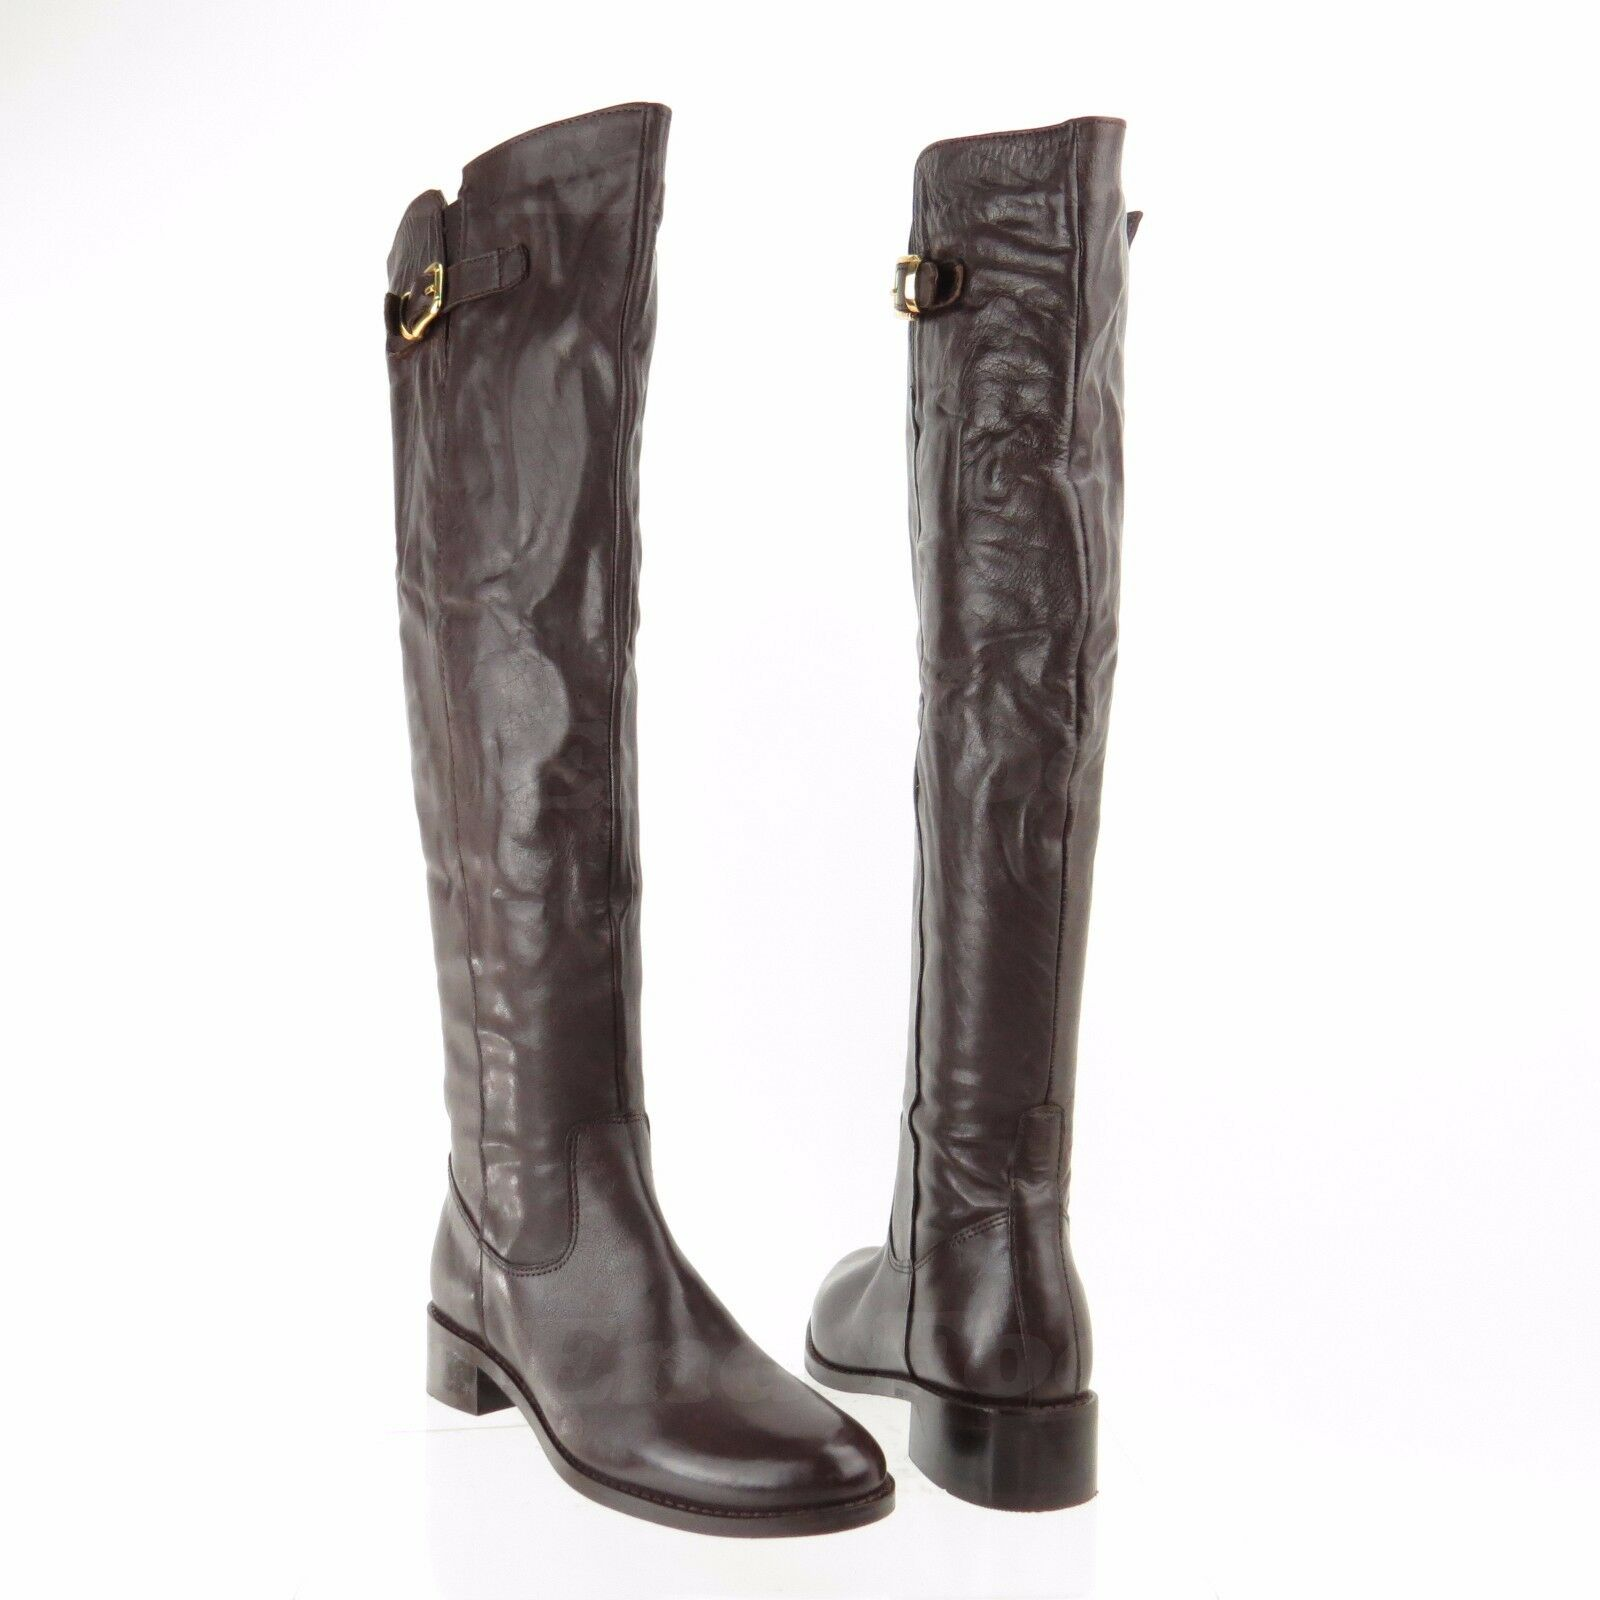 Catherine Malandrino Aria para mujeres Zapatos Marrón rodilla alta botas Nuevo